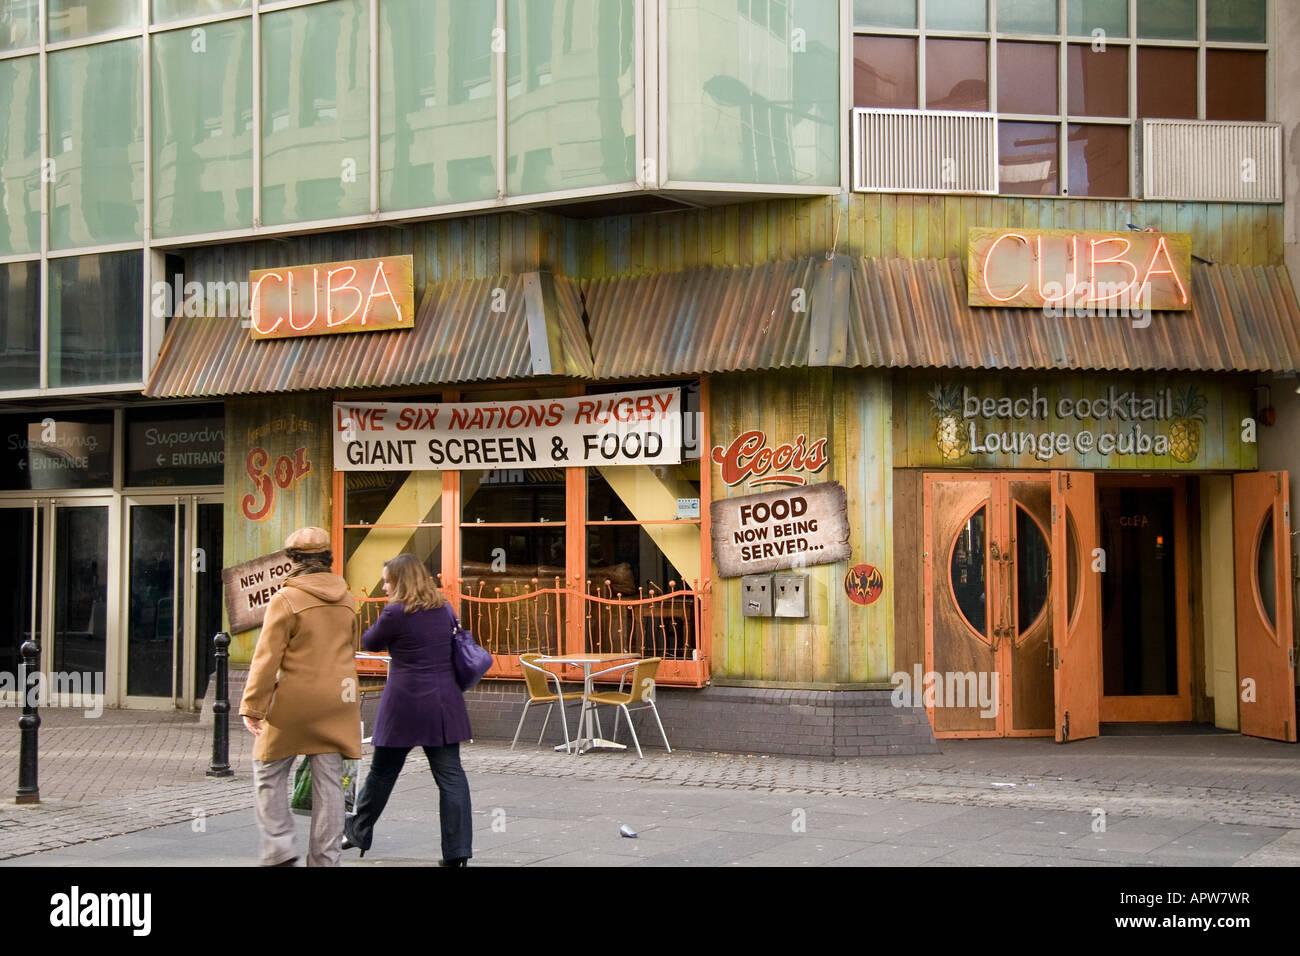 Bar Cuba The Friary Cardiff - Stock Image